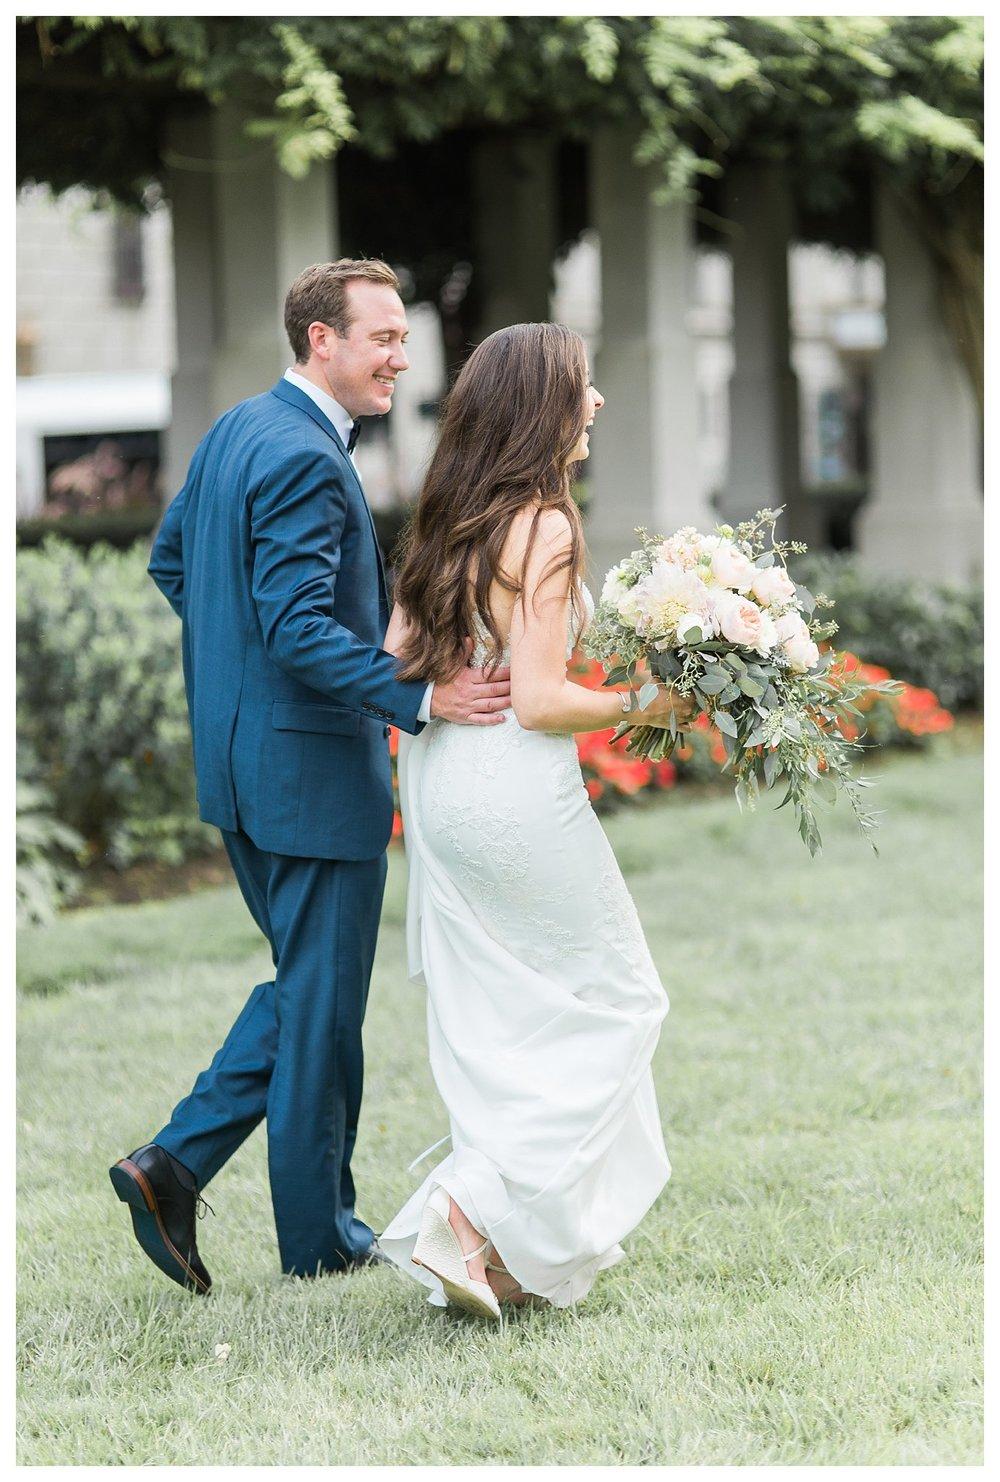 everleigh-photography-cincinnati-wedding-photographer-the-backstage-event-center-adamandlauren-58